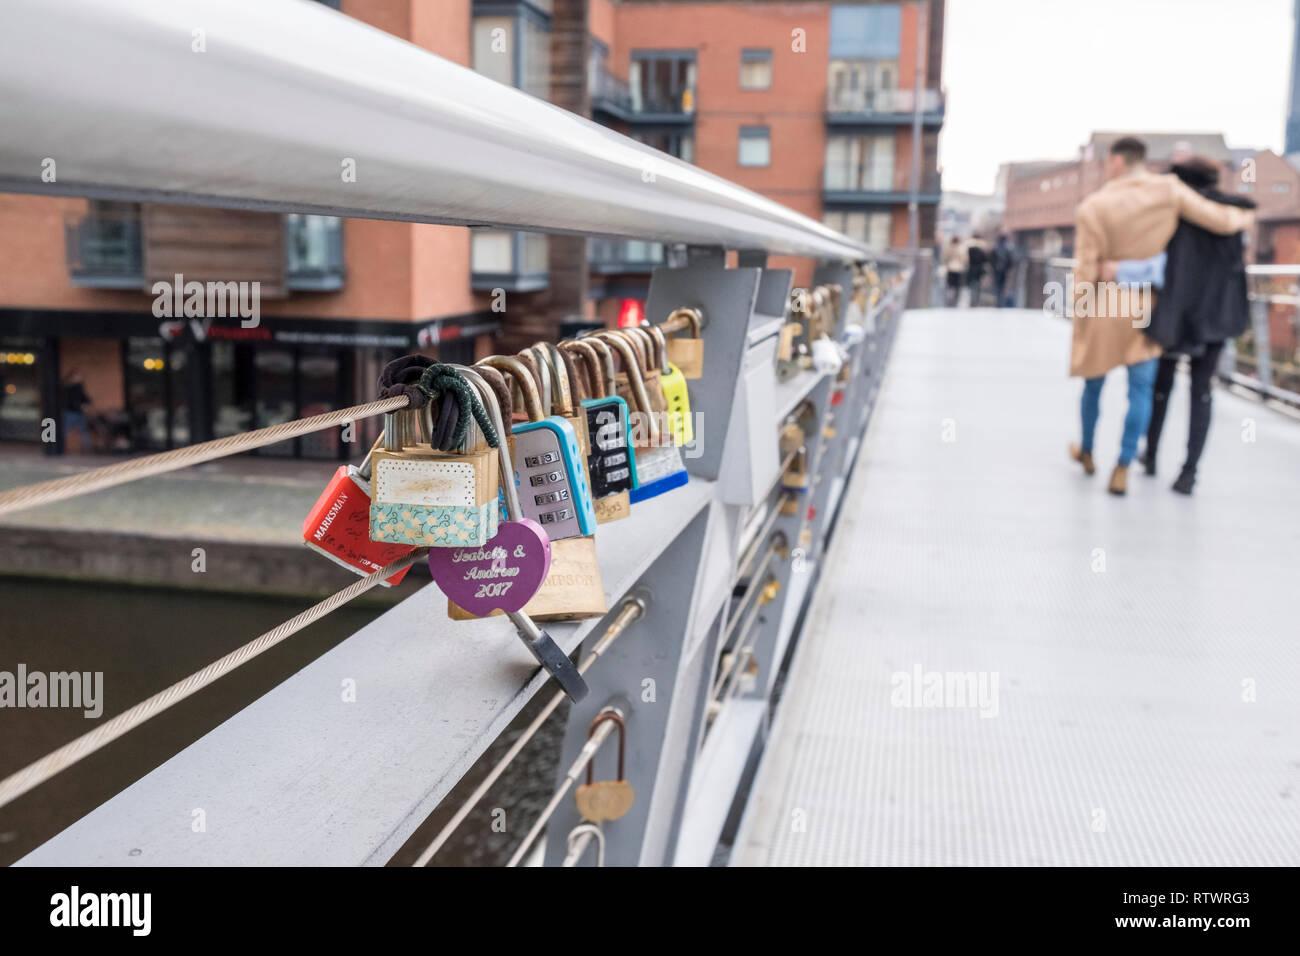 Embracing couple walk past Lovelocks or love locks padlocked on to a bridge in Birmingham, England, GB, UK. Stock Photo